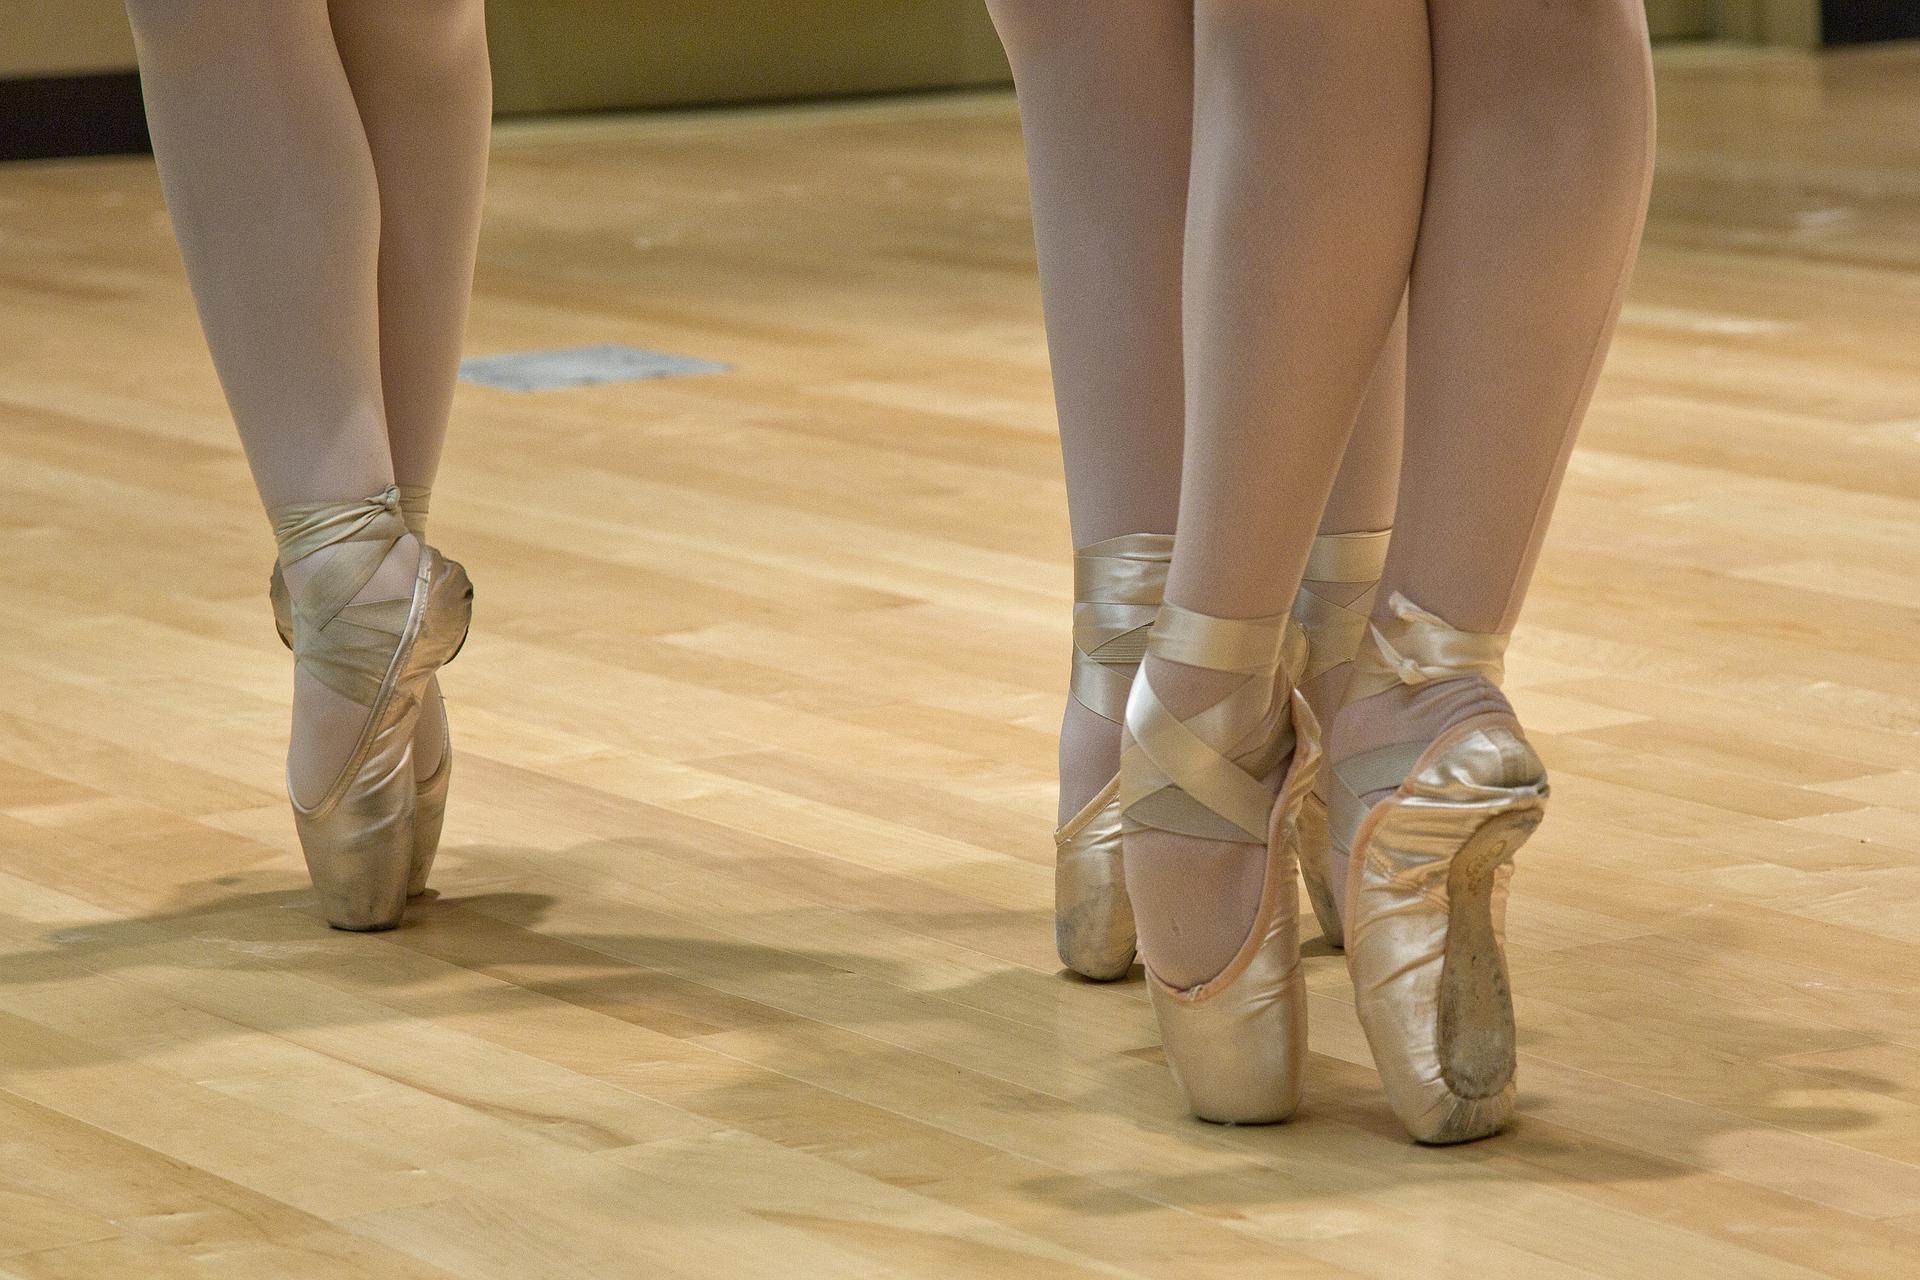 ballet-shoes-999807_1920.jpg